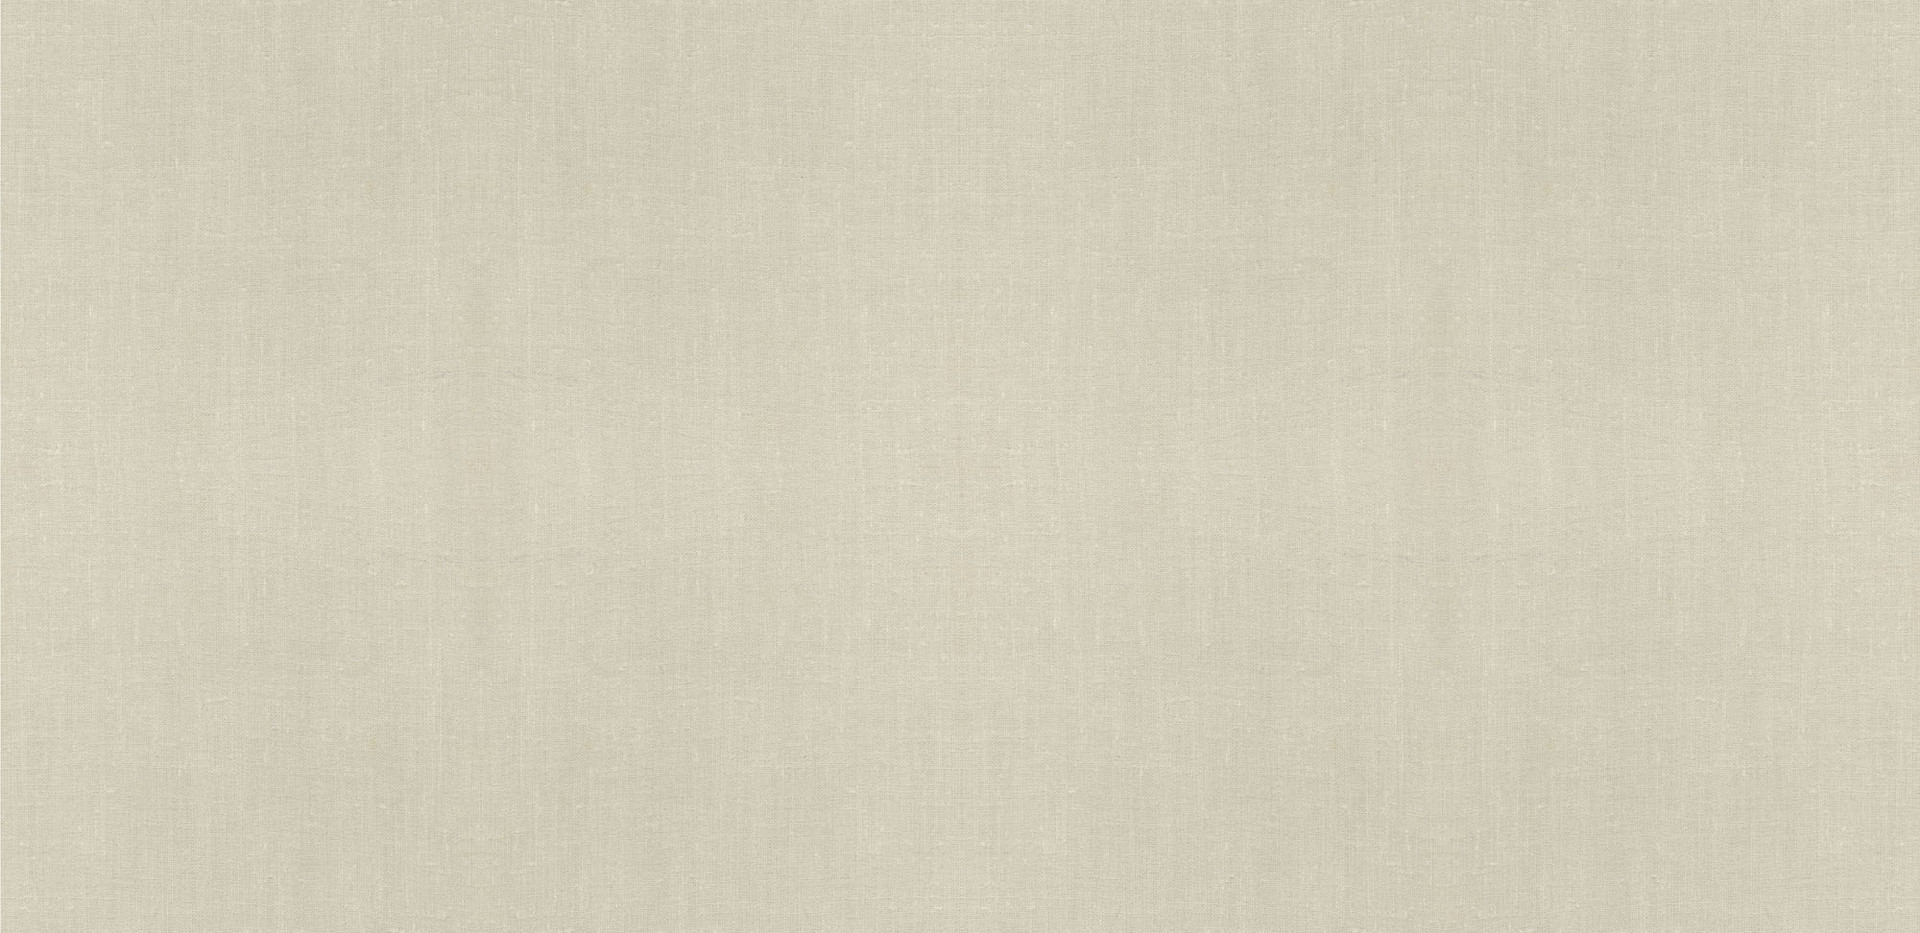 Color Block Linen . Neutral Solid